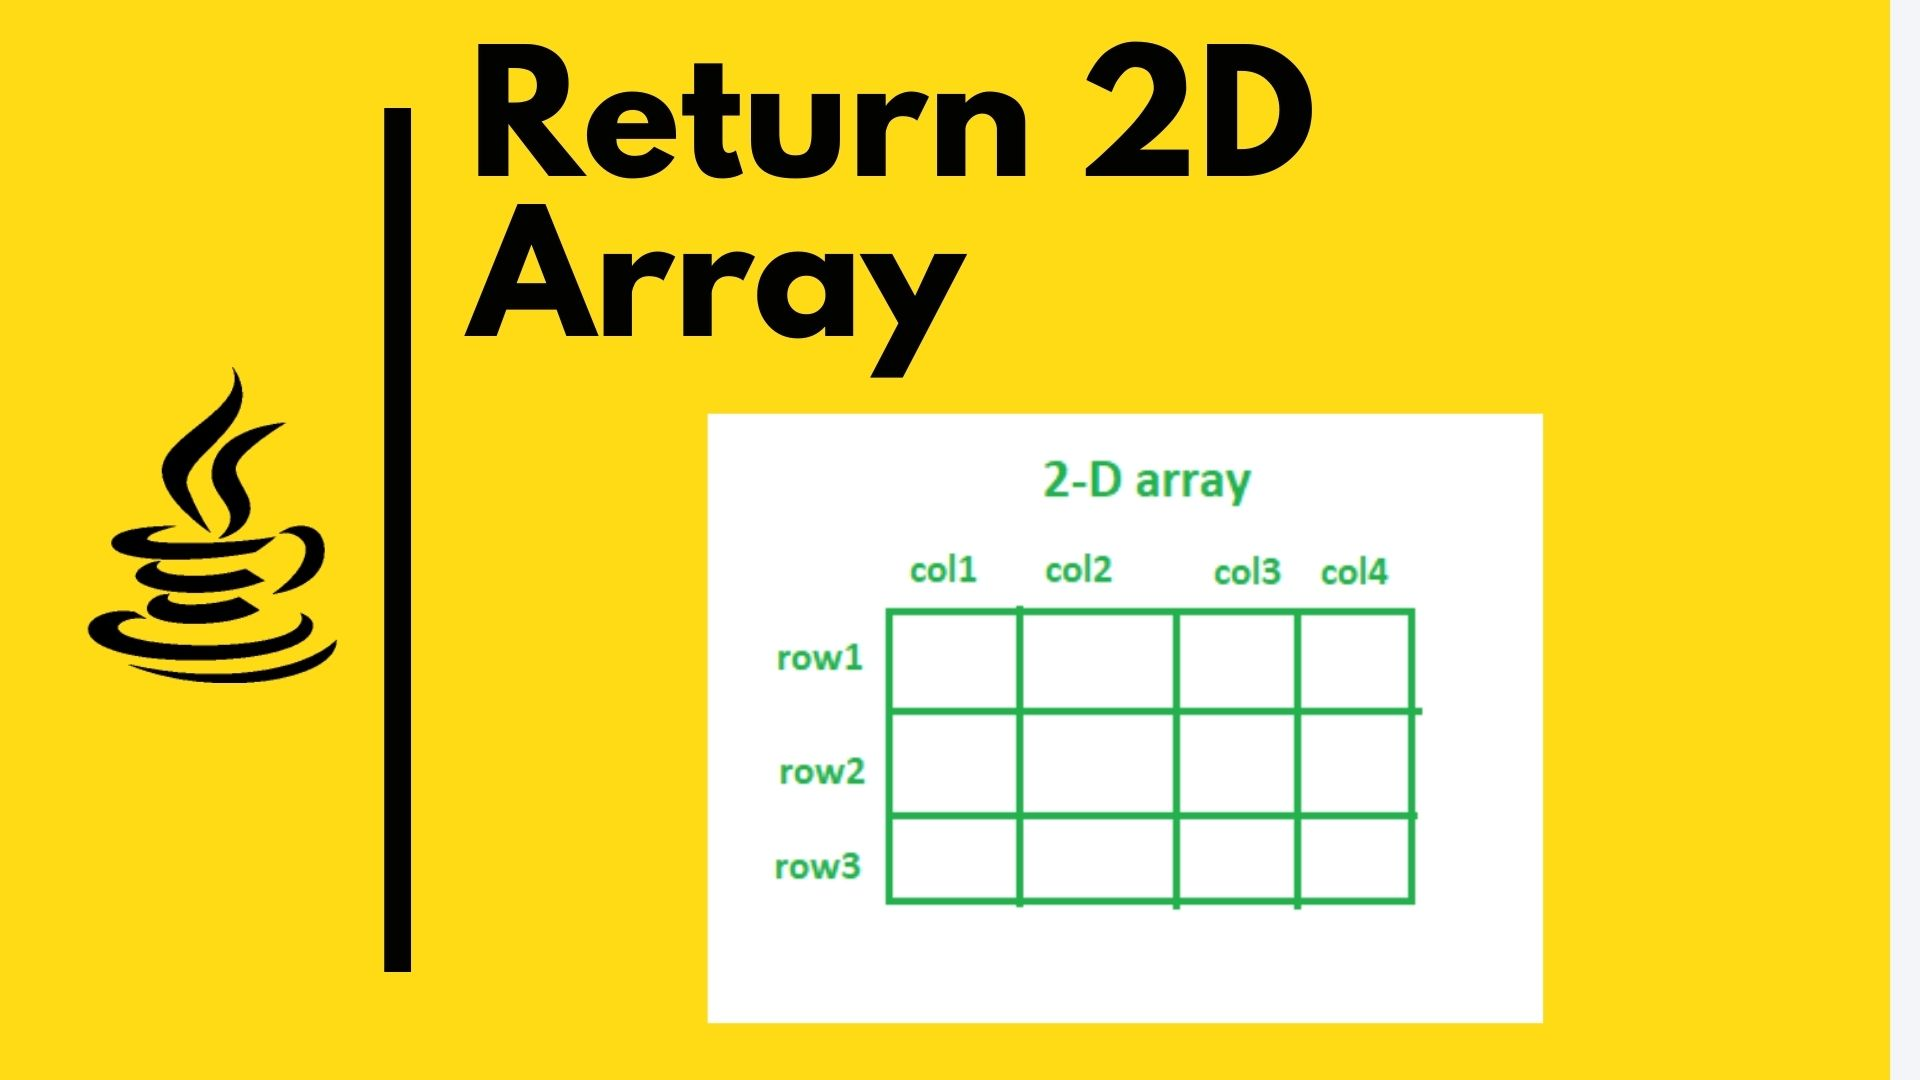 Return a 2D array from a method